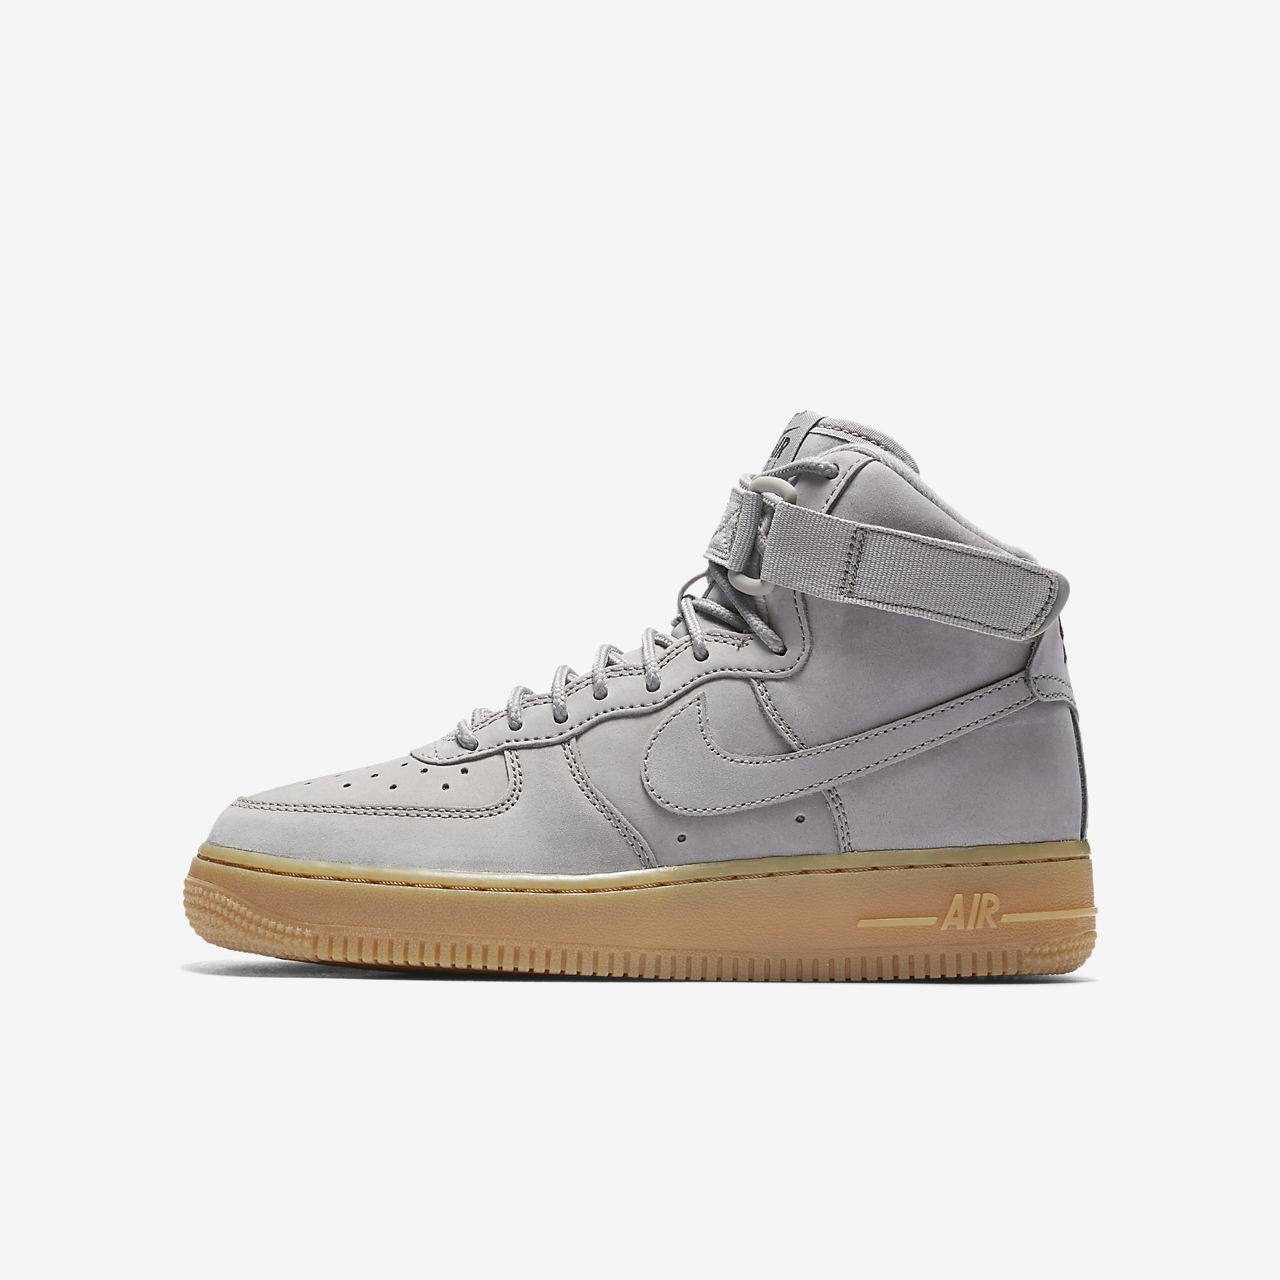 Nike Air Force 1 High Wb Big Kids Shoe Kids Shoes Kids Shoes Nike Force 1